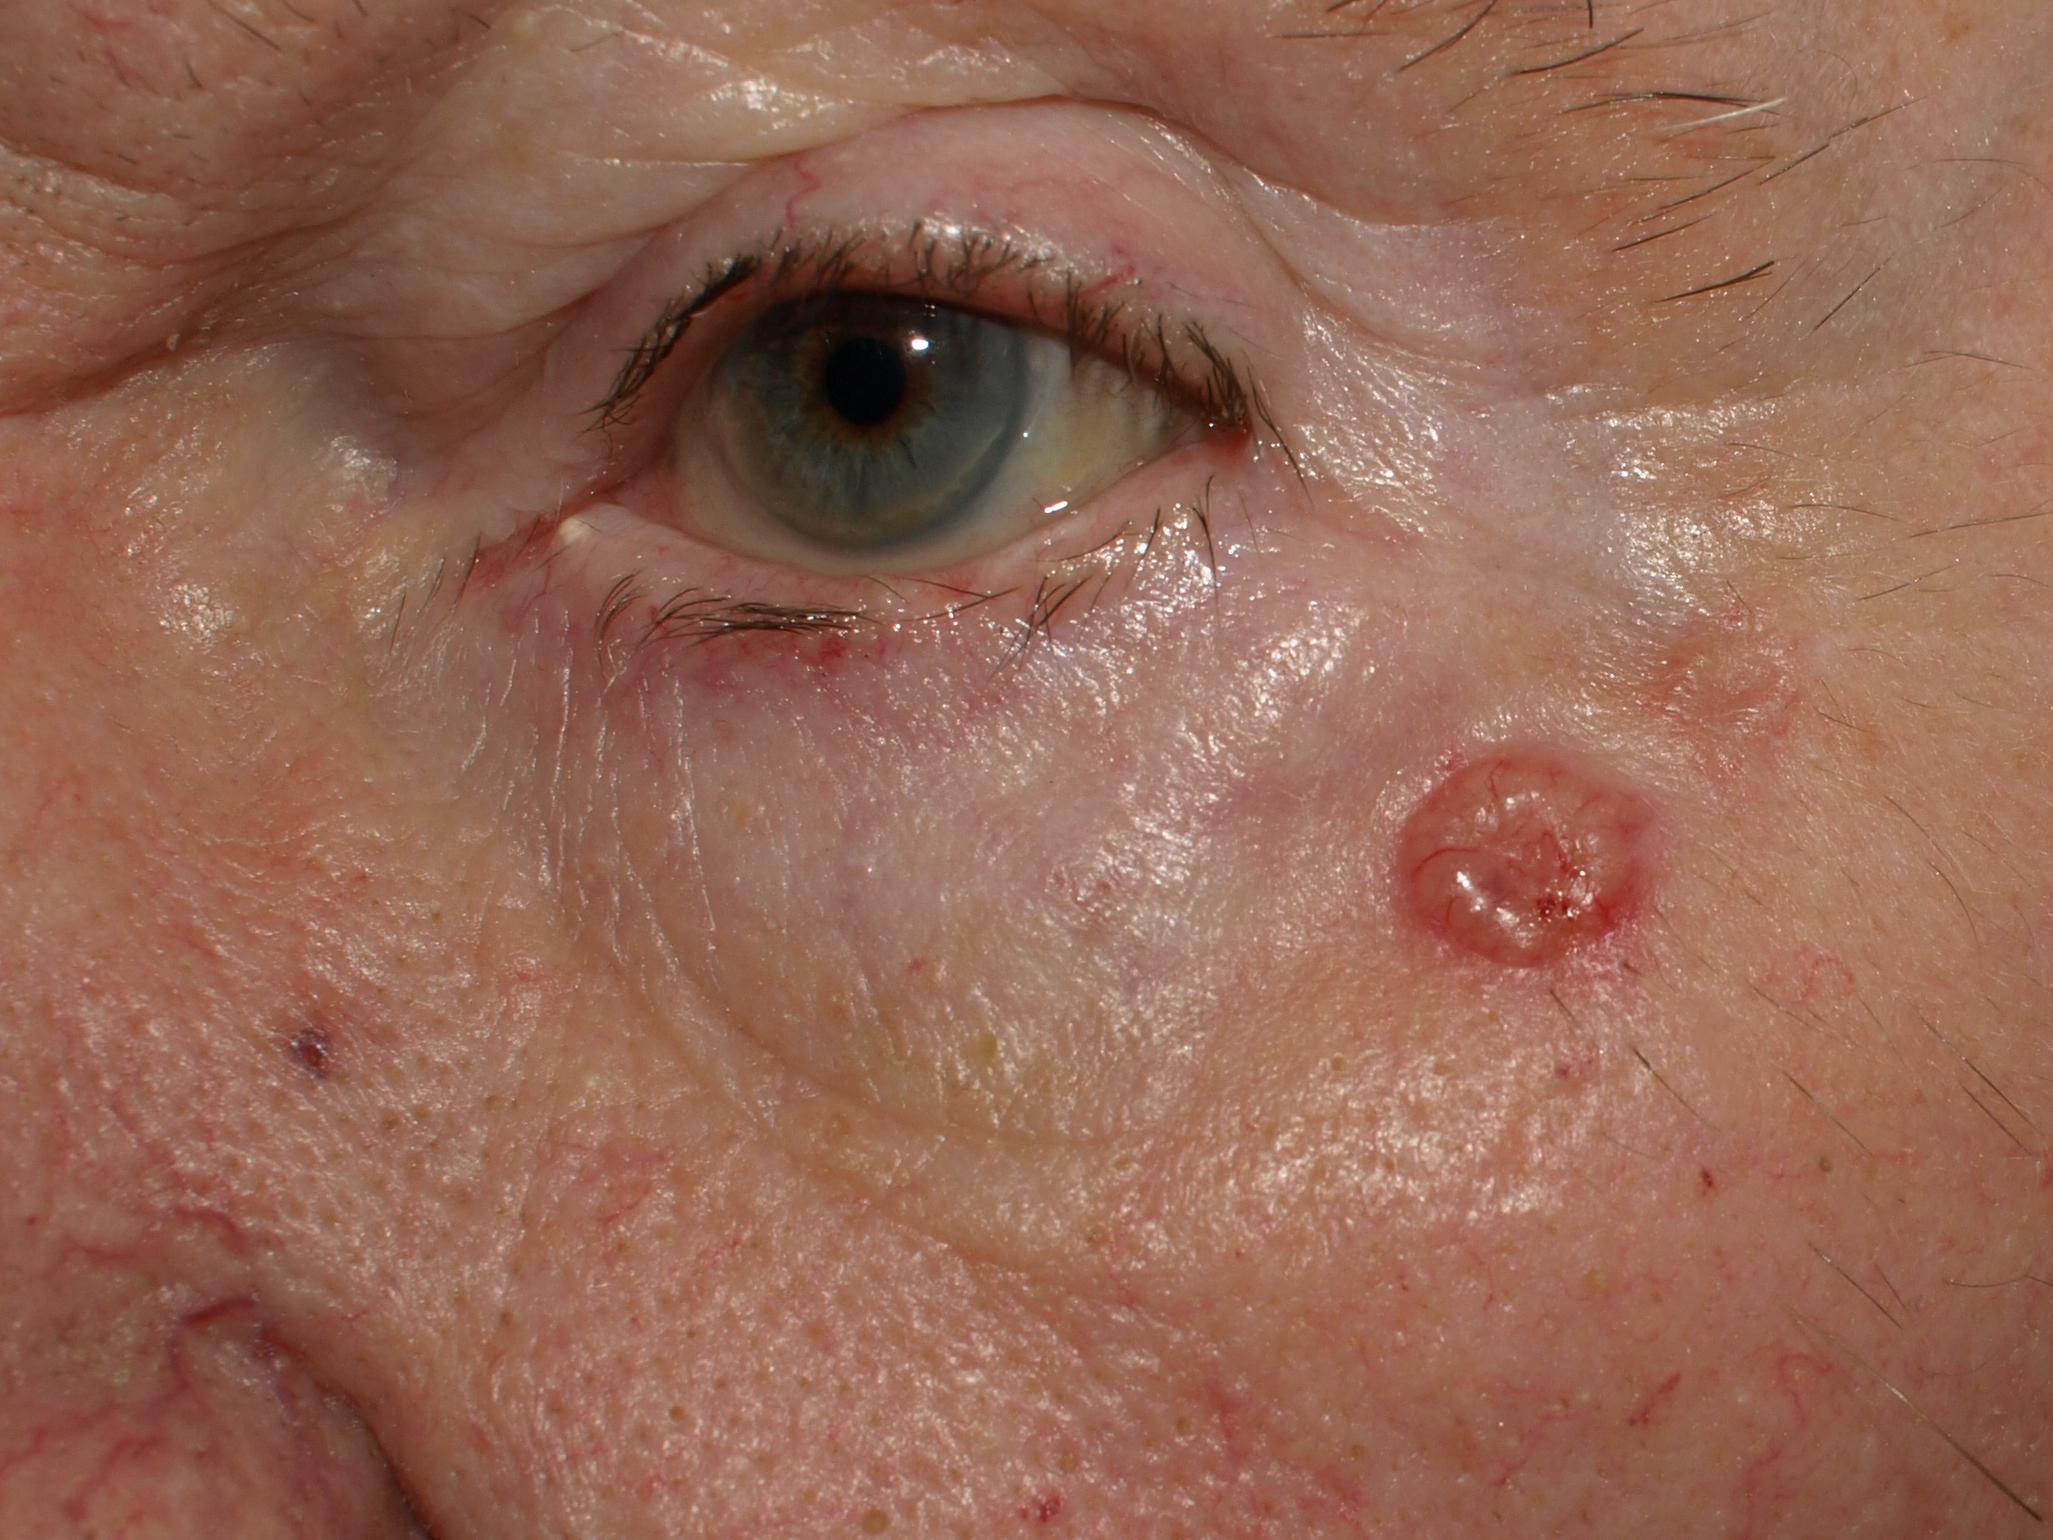 Skin Cancer: Basal Cell Cancer and Melanoma (Malignant ...